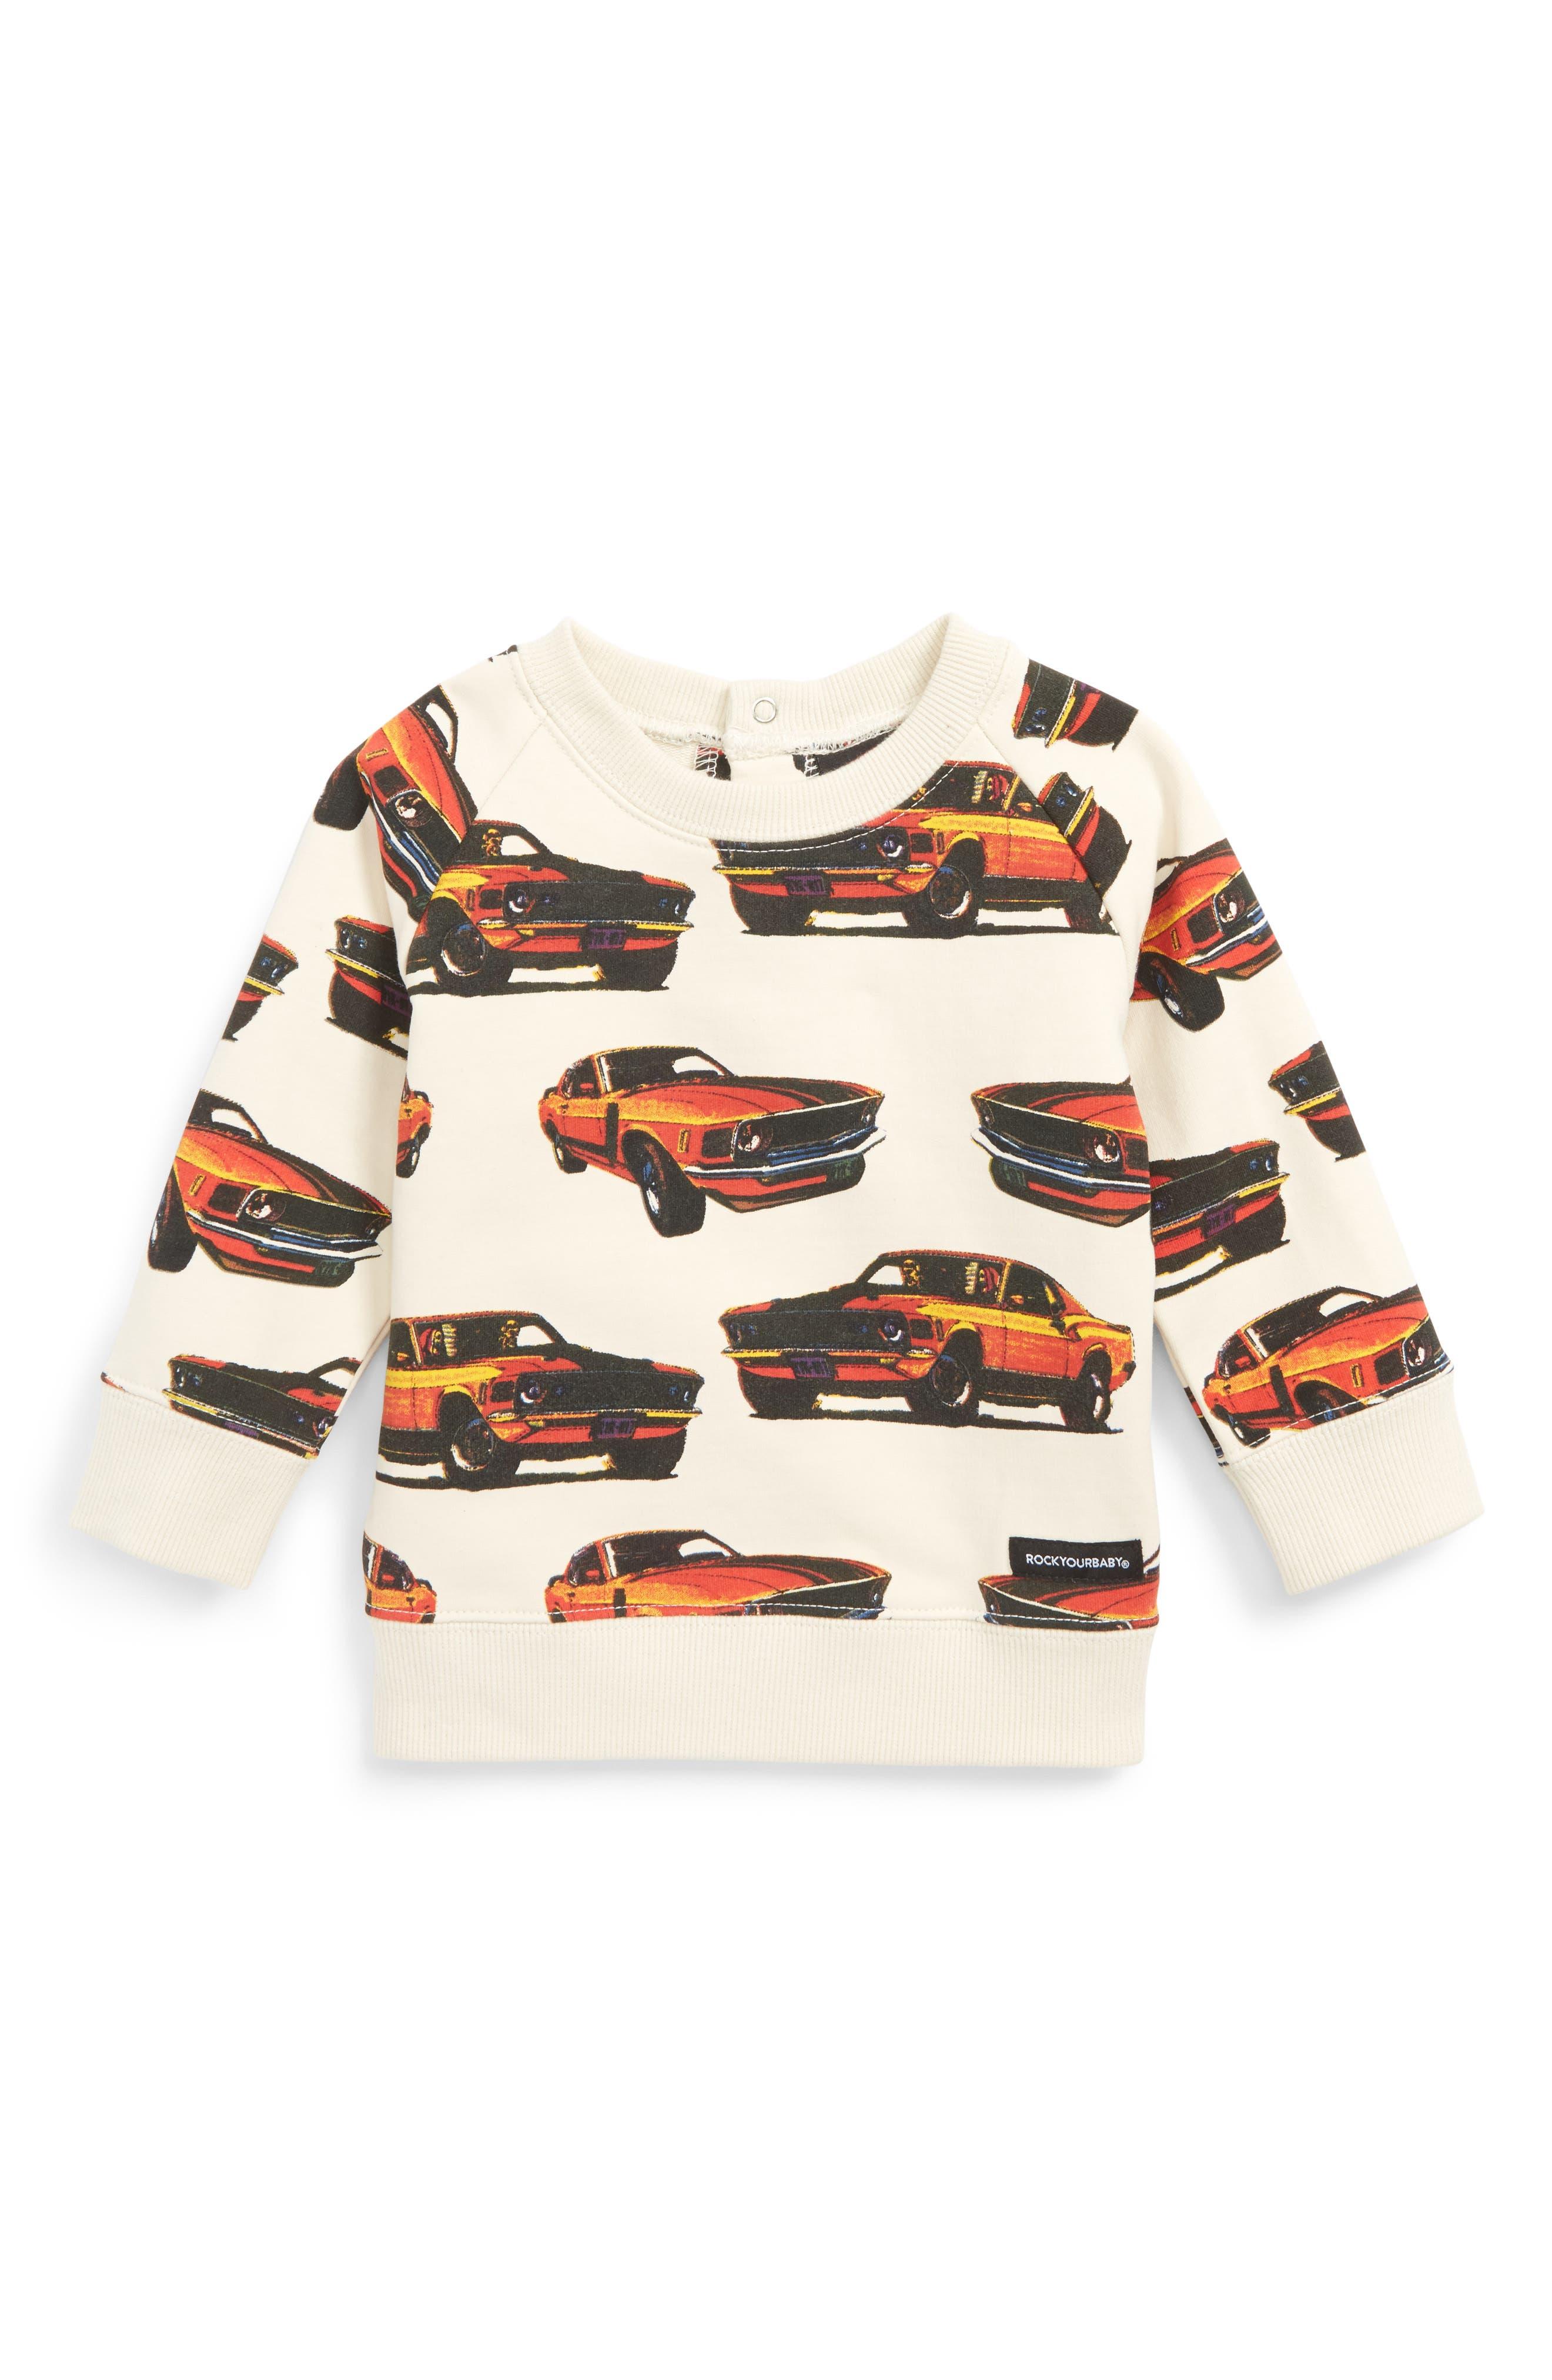 Eat My Dust Sweatshirt,                         Main,                         color, White Multi